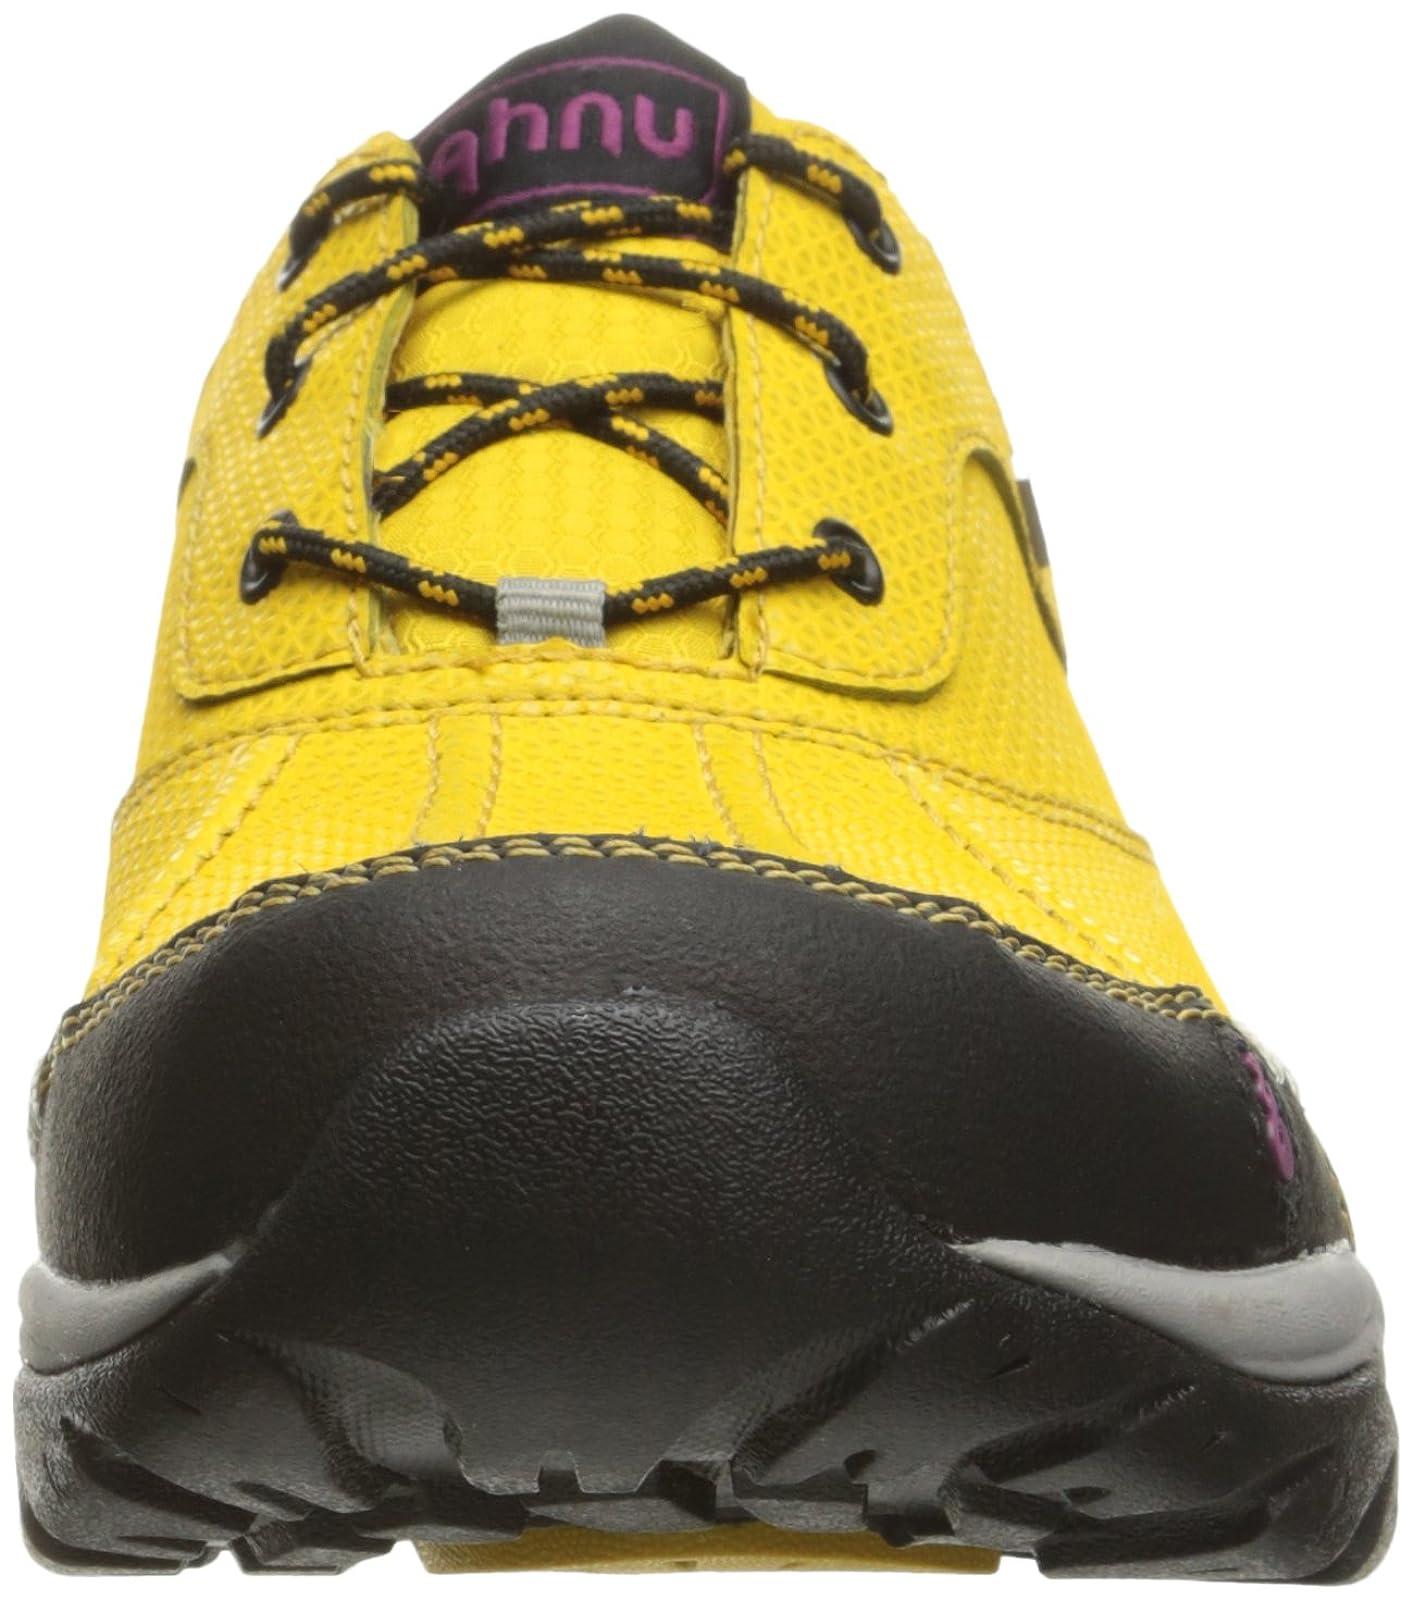 Ahnu Women's Calaveras Waterproof Hiking Shoe 5 M US - 4